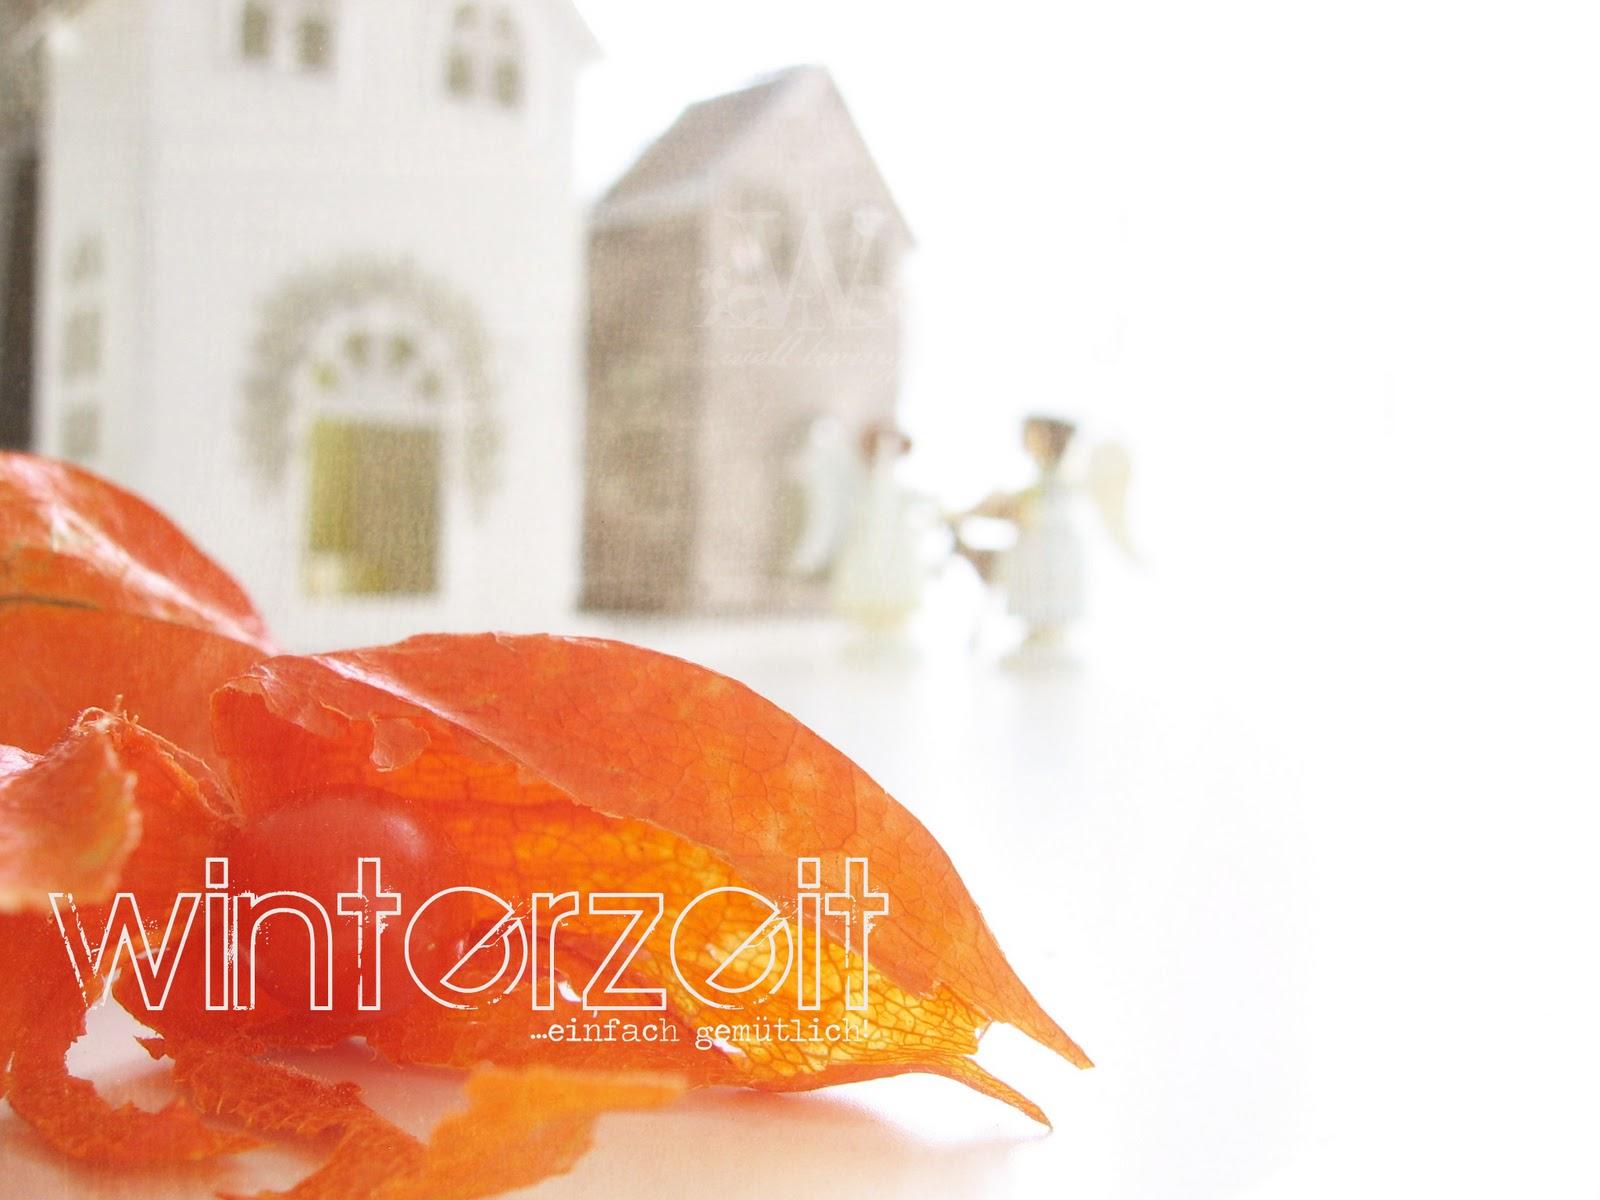 http://4.bp.blogspot.com/_vGuBhXbtgU8/TN7t1VvD5WI/AAAAAAAAA2k/ILOTB1Zek8A/s1600/wallpaper_winter.jpg